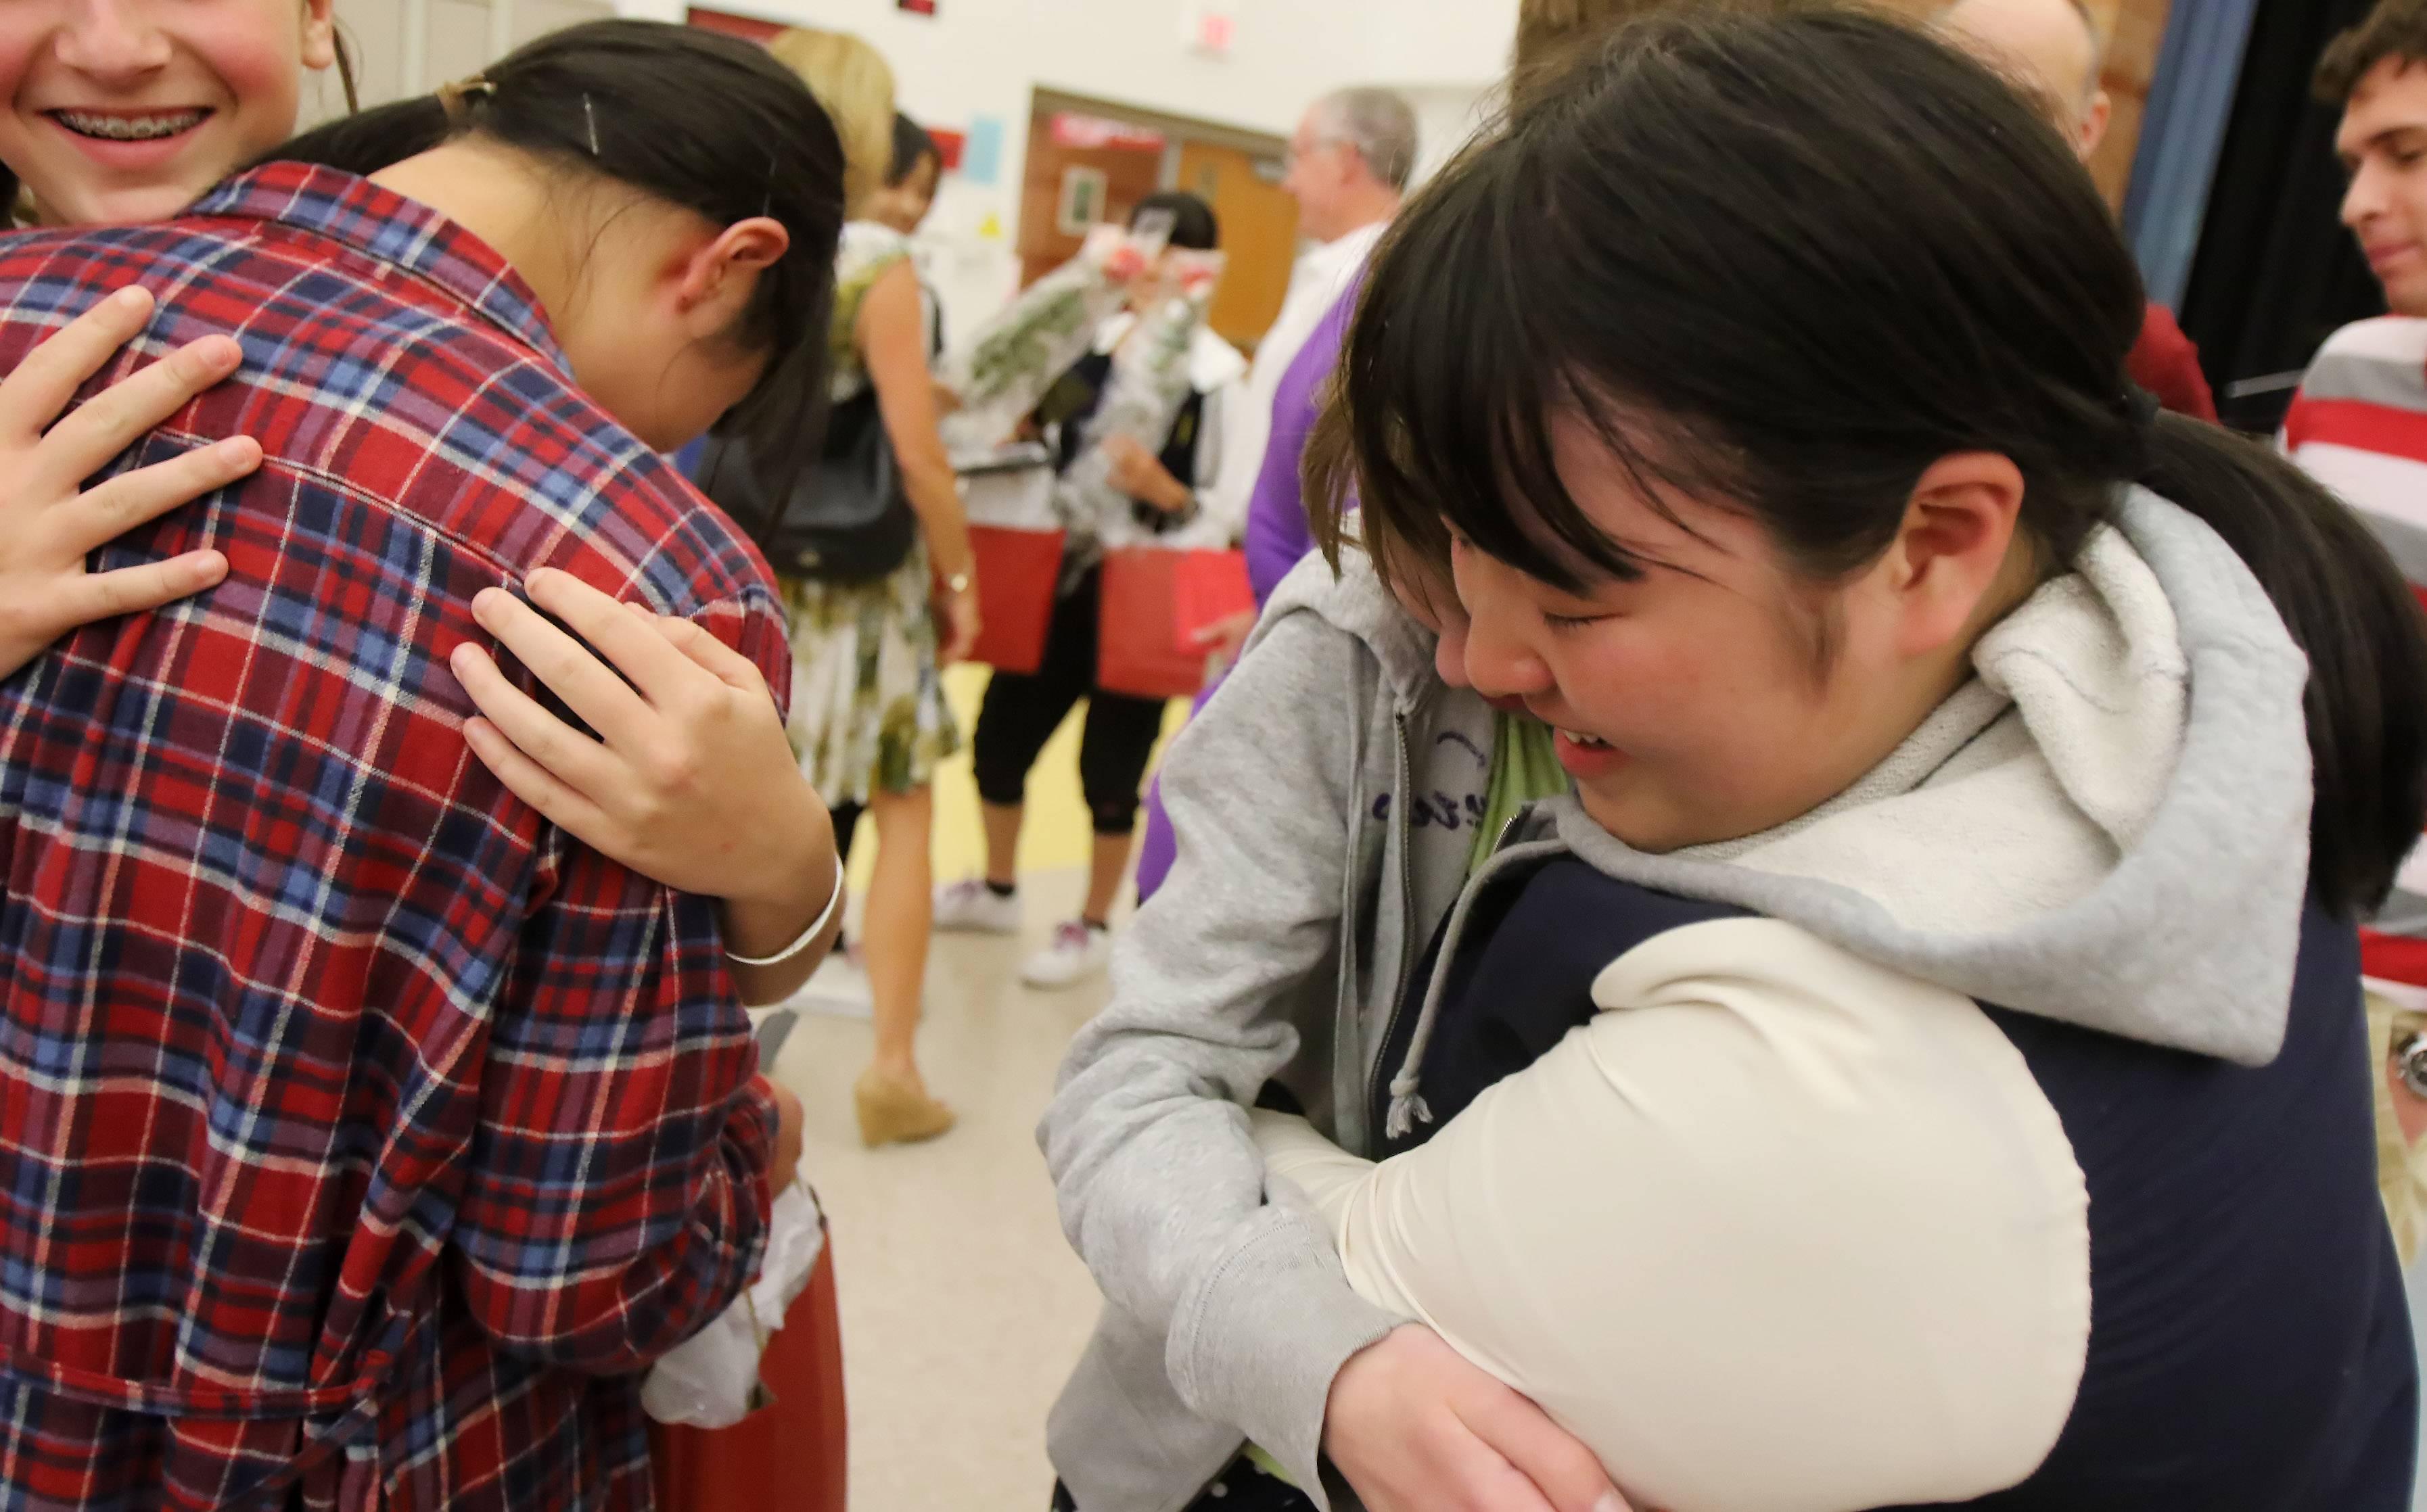 District 25 says 'Sayonara' to Japanese exchange students